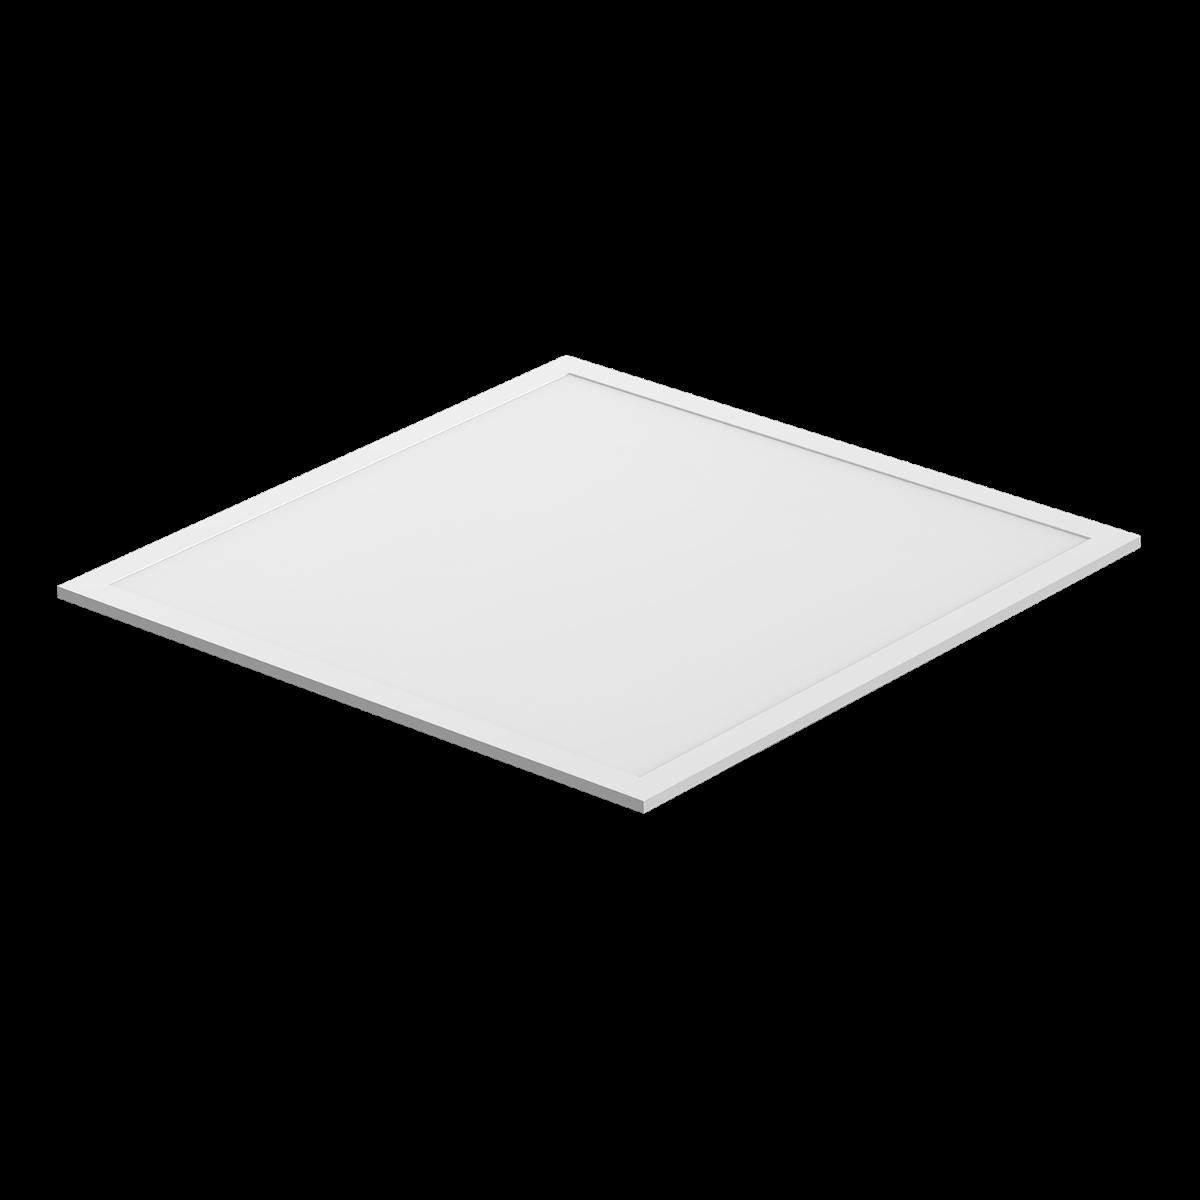 Noxion LED Panel Econox 32W Xitanium DALI 60x60cm 4000K 4400lm UGR <22   Dali Dimbar - Kallvit - Ersättare 4x18W